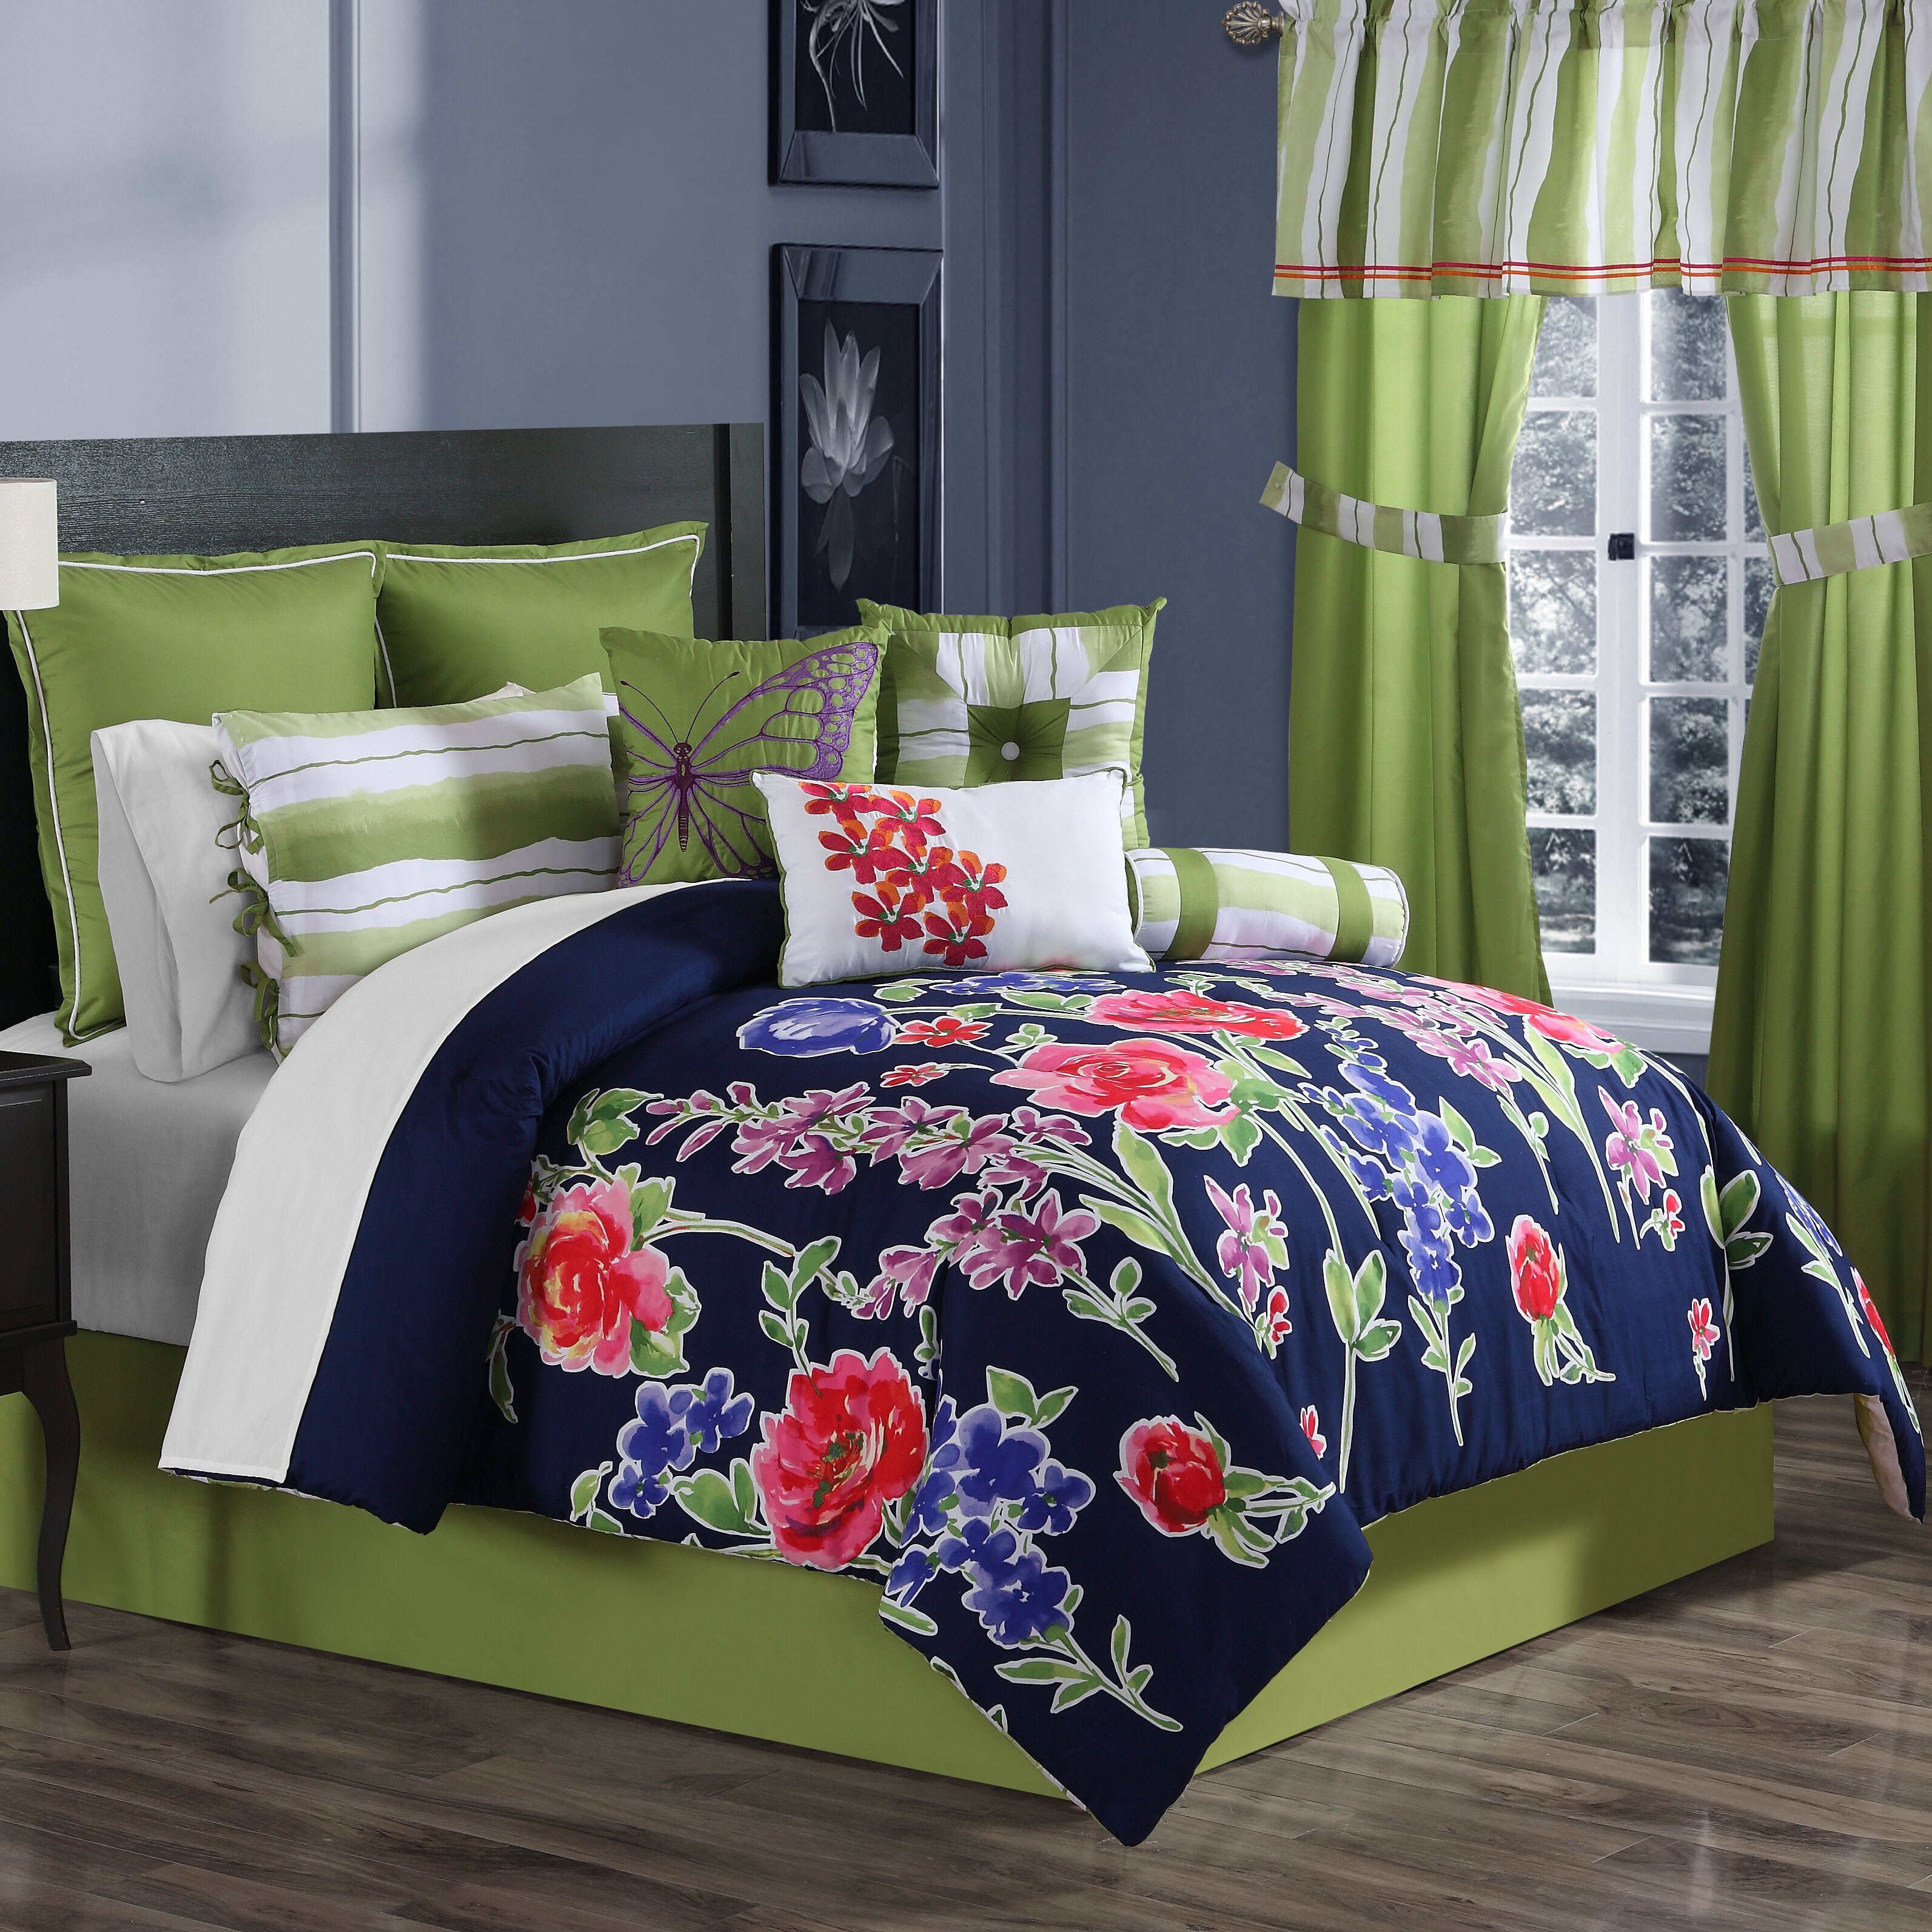 ellison first asia nadia 10 piece comforter set & reviews | wayfair